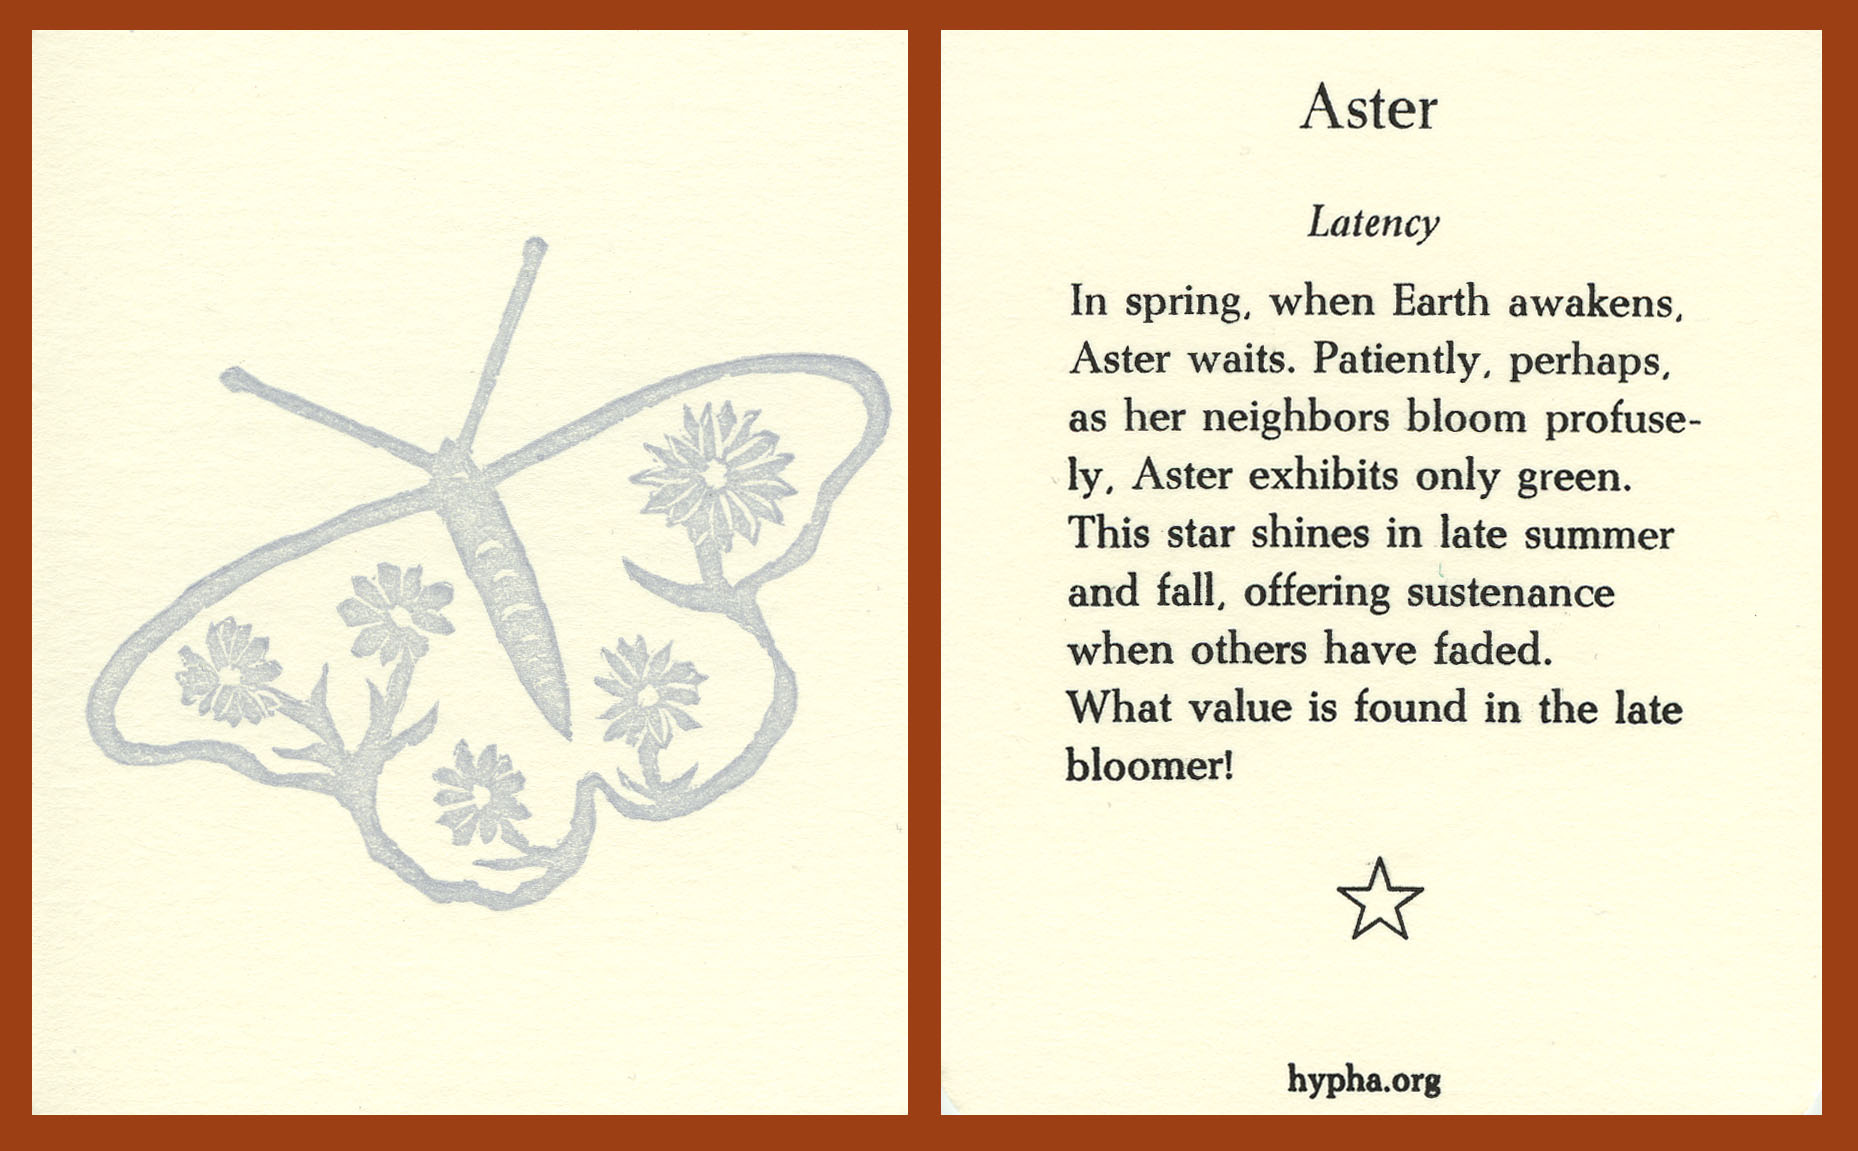 aster card.jpg